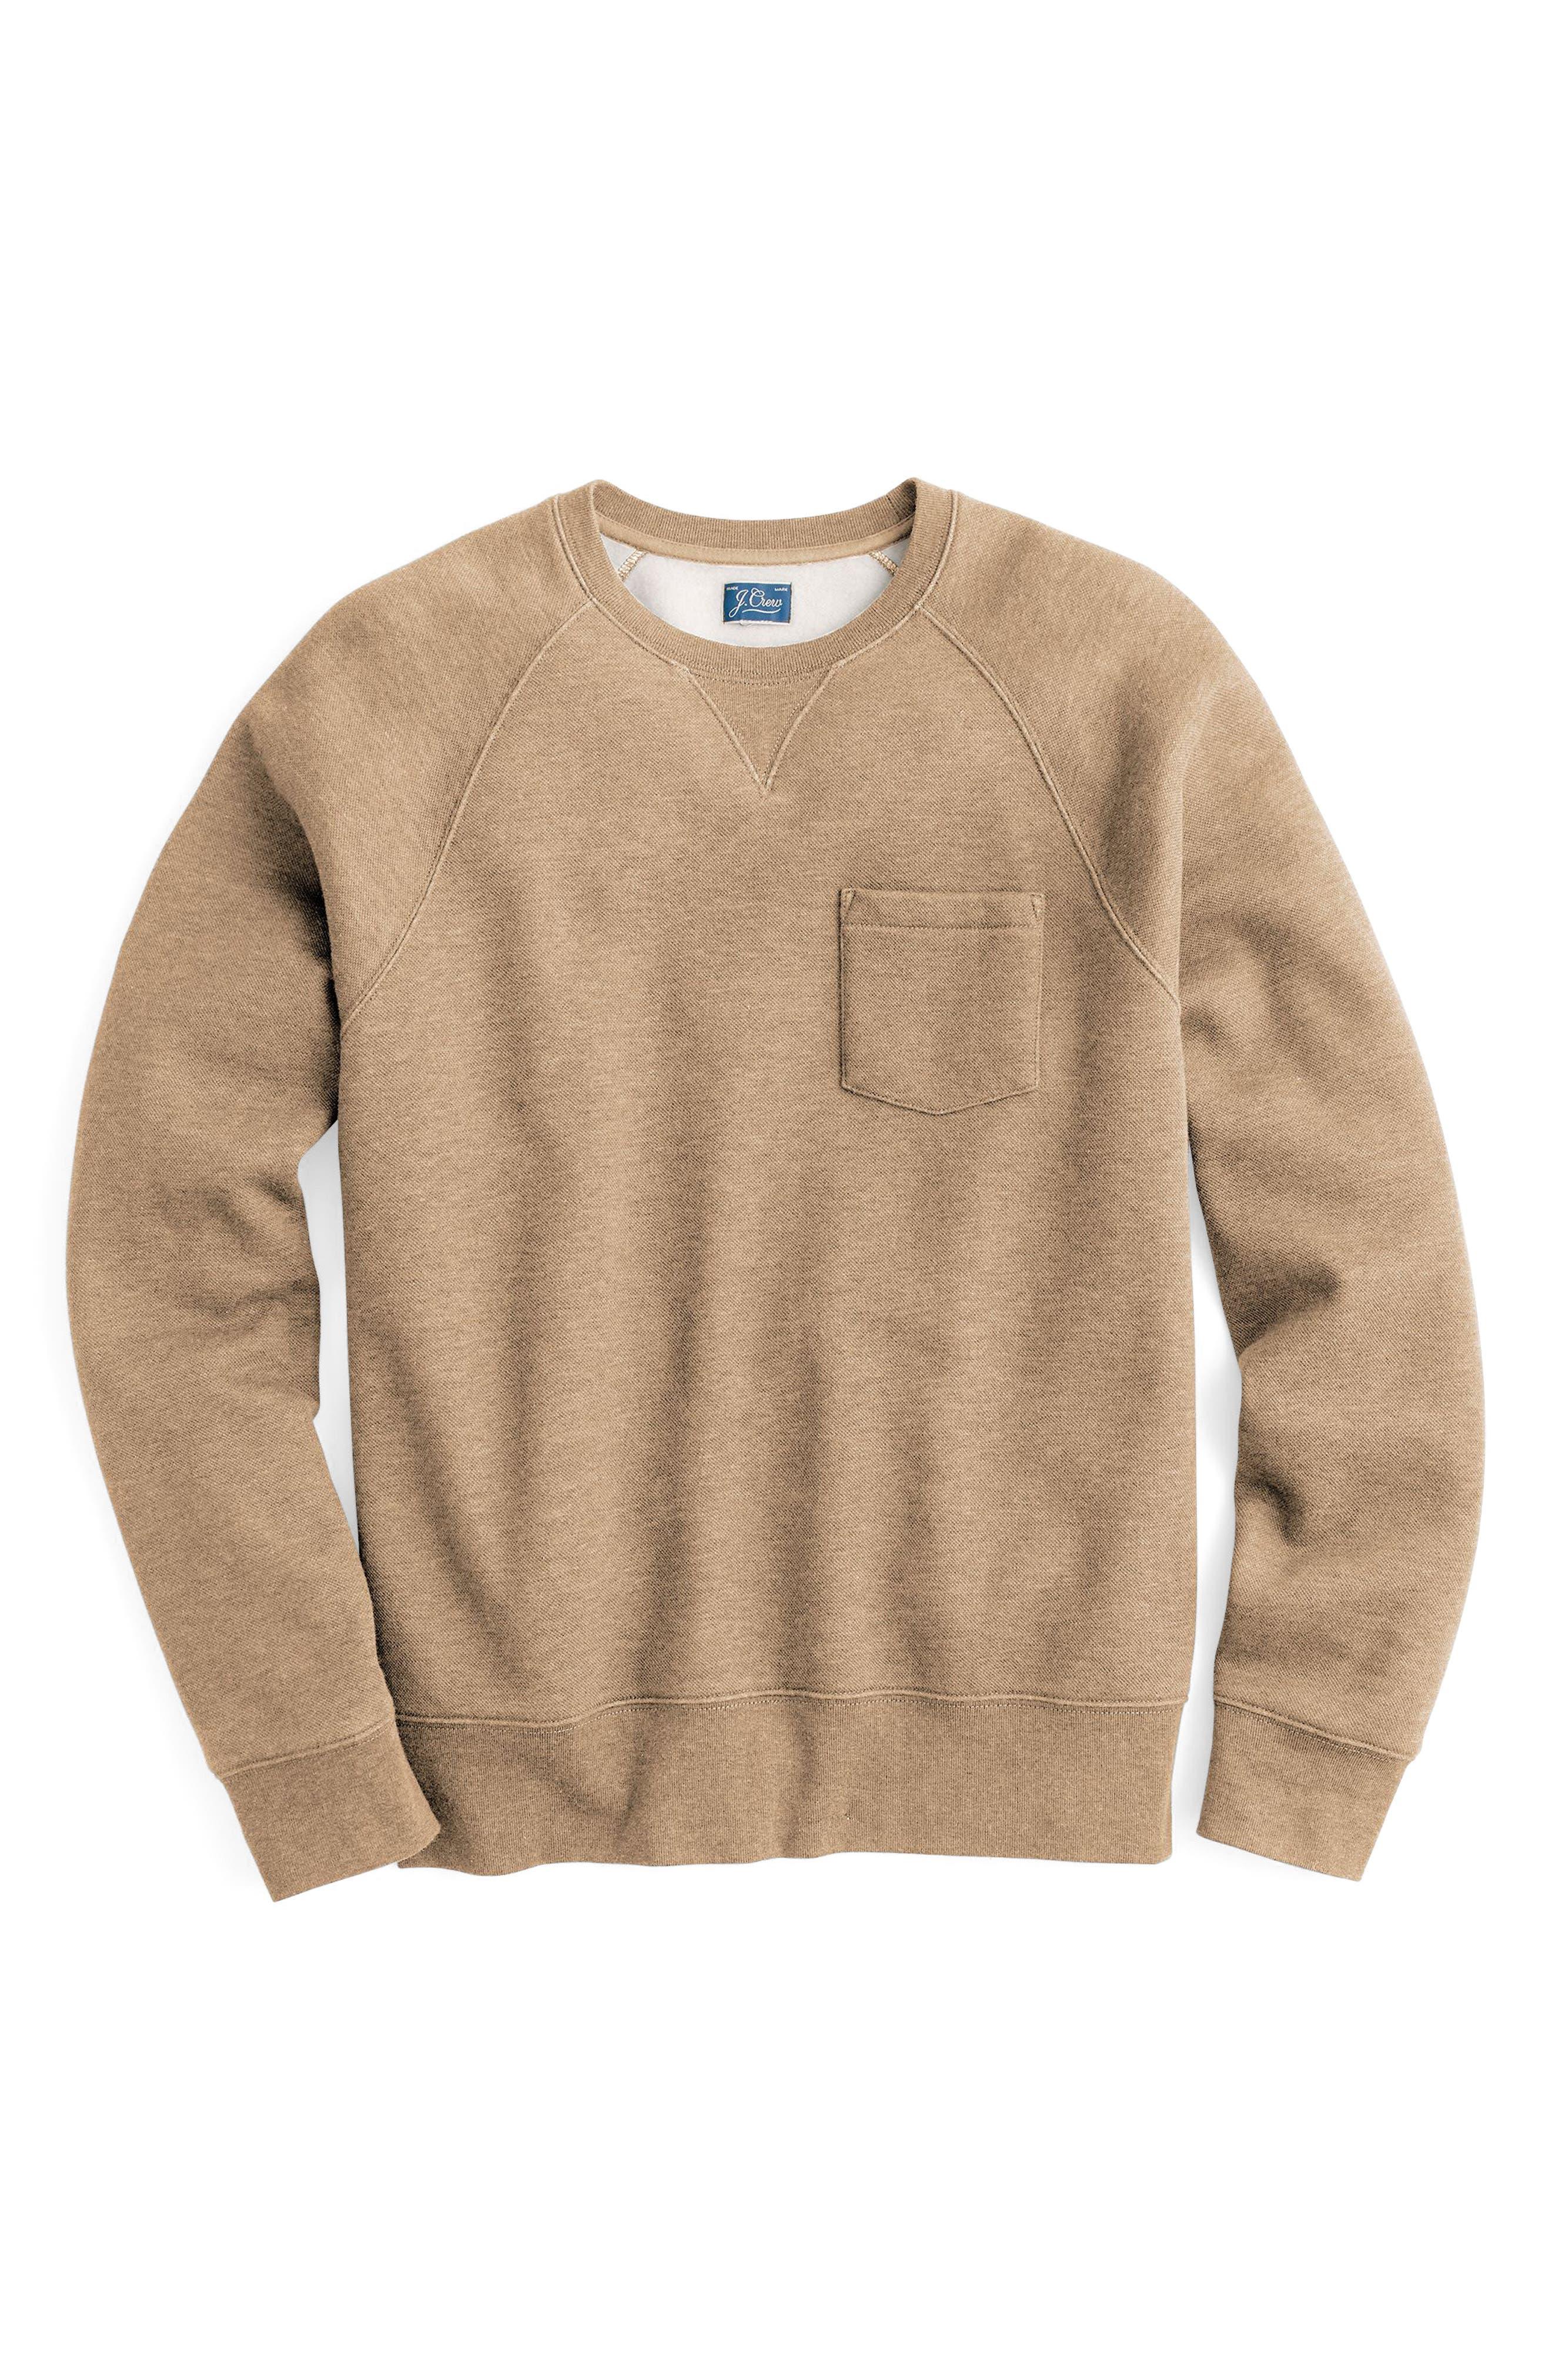 Textured Piqué Fleece Sweatshirt,                             Alternate thumbnail 3, color,                             Heather Nut